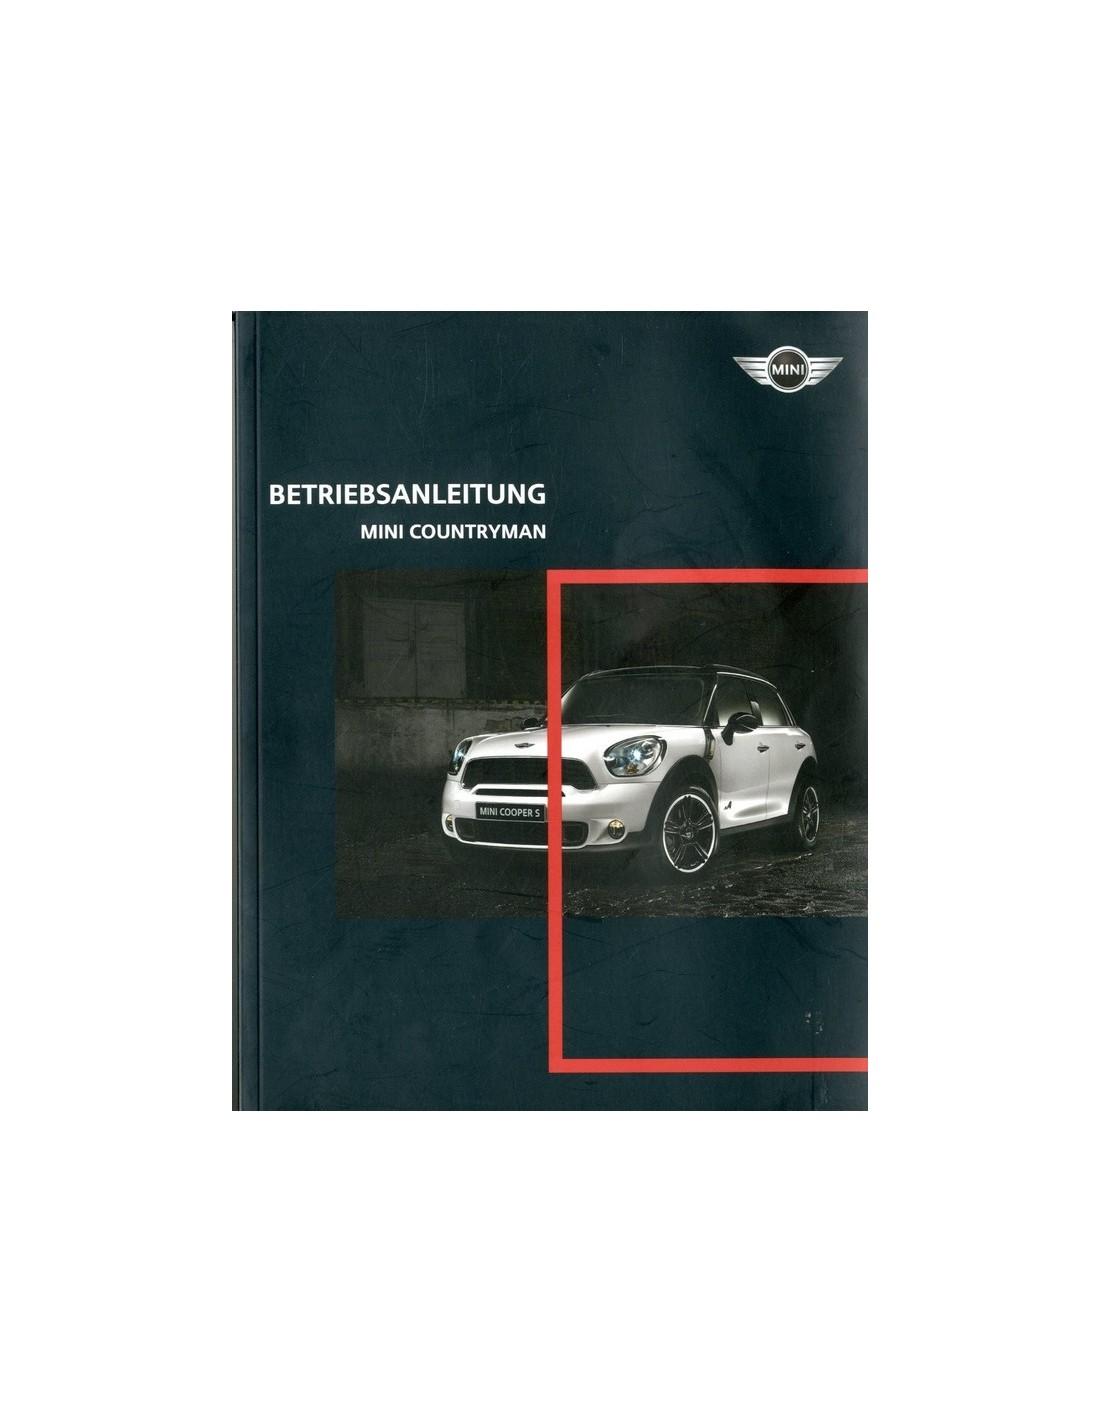 2010 mini countryman owner s manual german rh autolit eu 2010 mini cooper s clubman owners manual 2010 mini cooper s owners manual